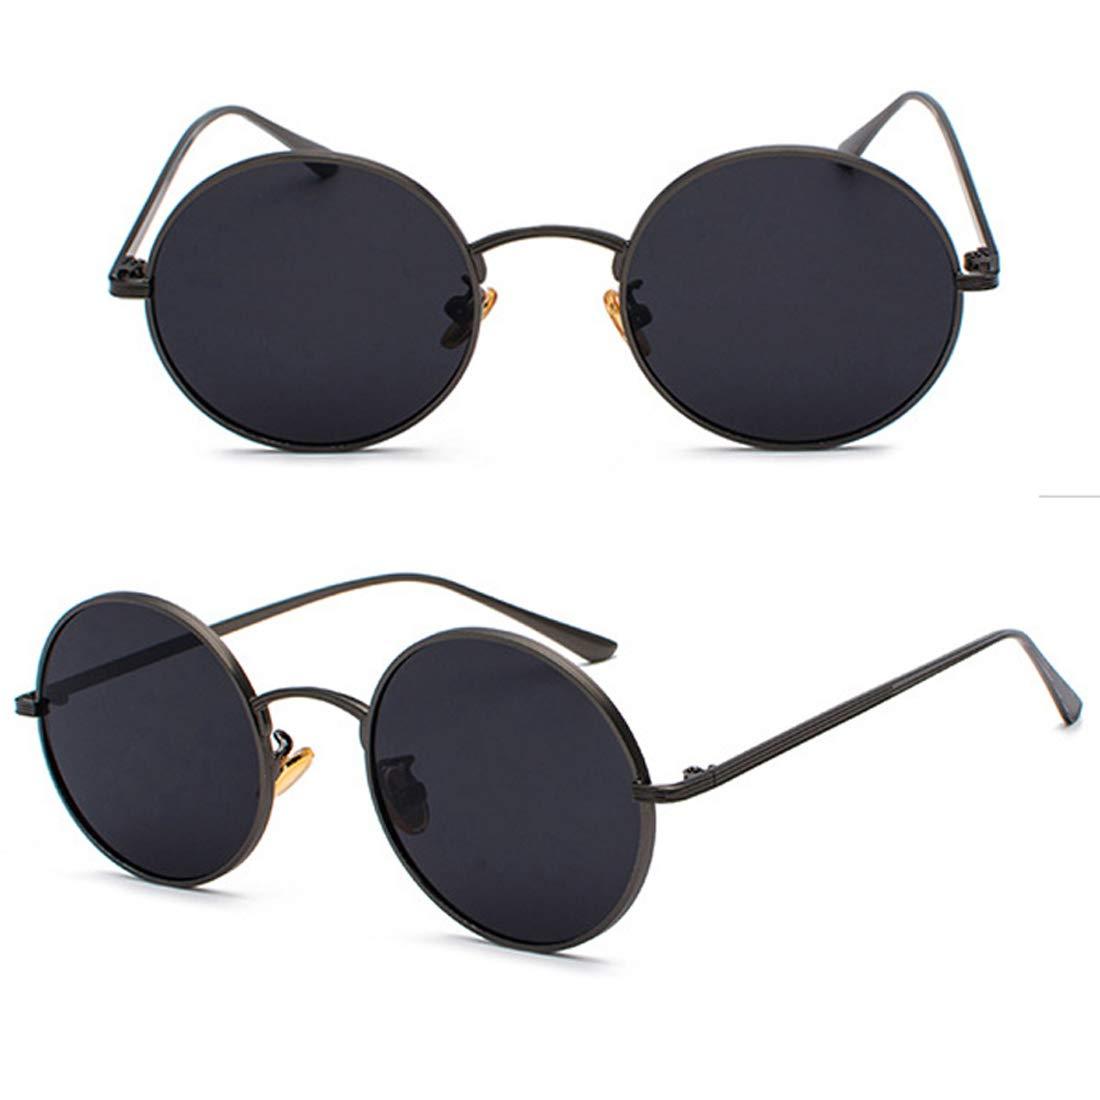 COASION Vintage Round Metal Sunglasses John Lennon Style Small Unisex Sun Glasses (Black Frame/Grey Lens)